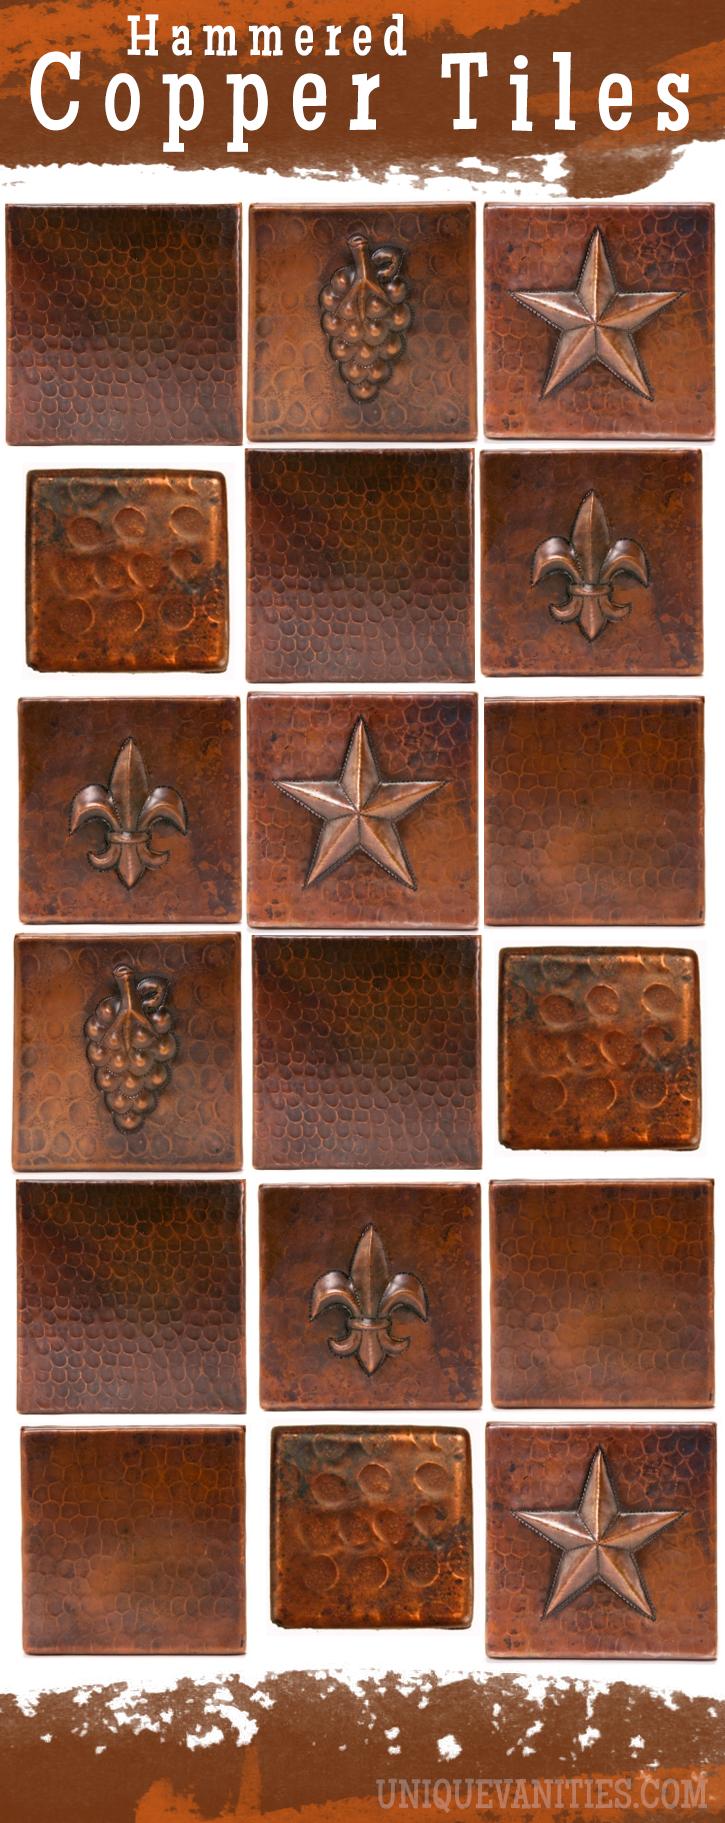 - Hammered Copper Tiles Copper Countertops, Unique Backsplash